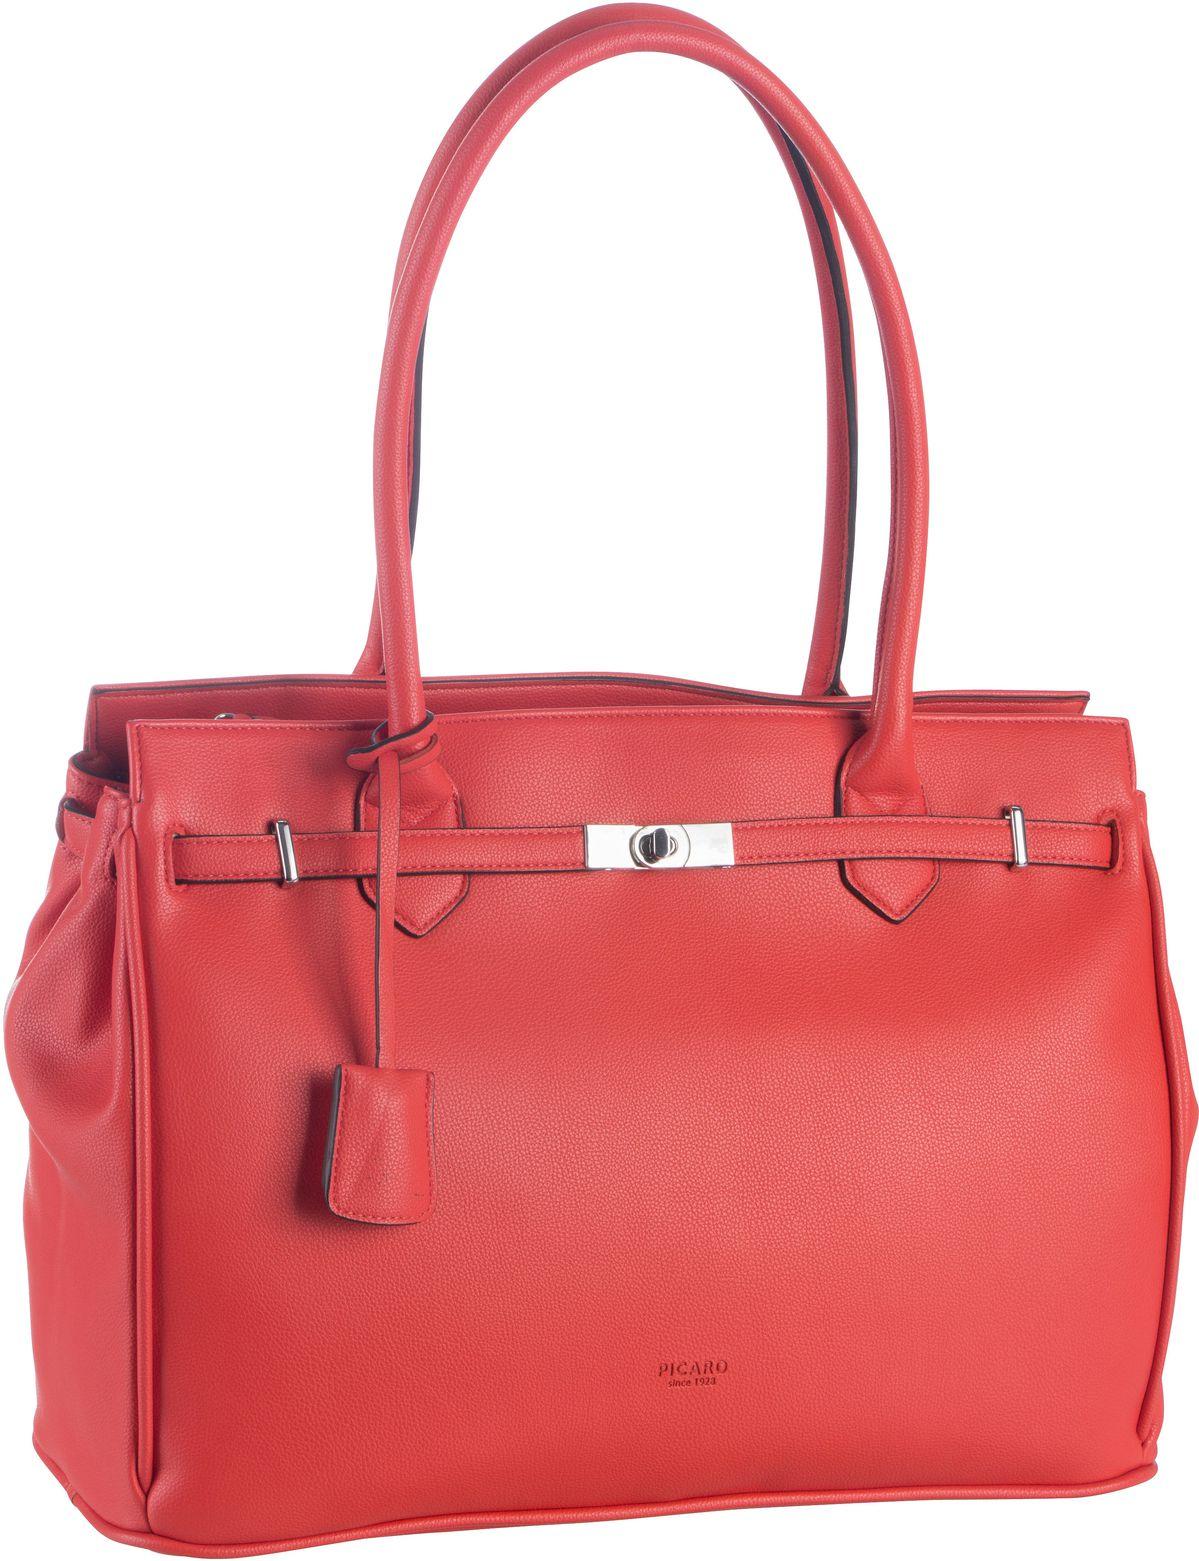 Handtasche New York 9680 Koralle